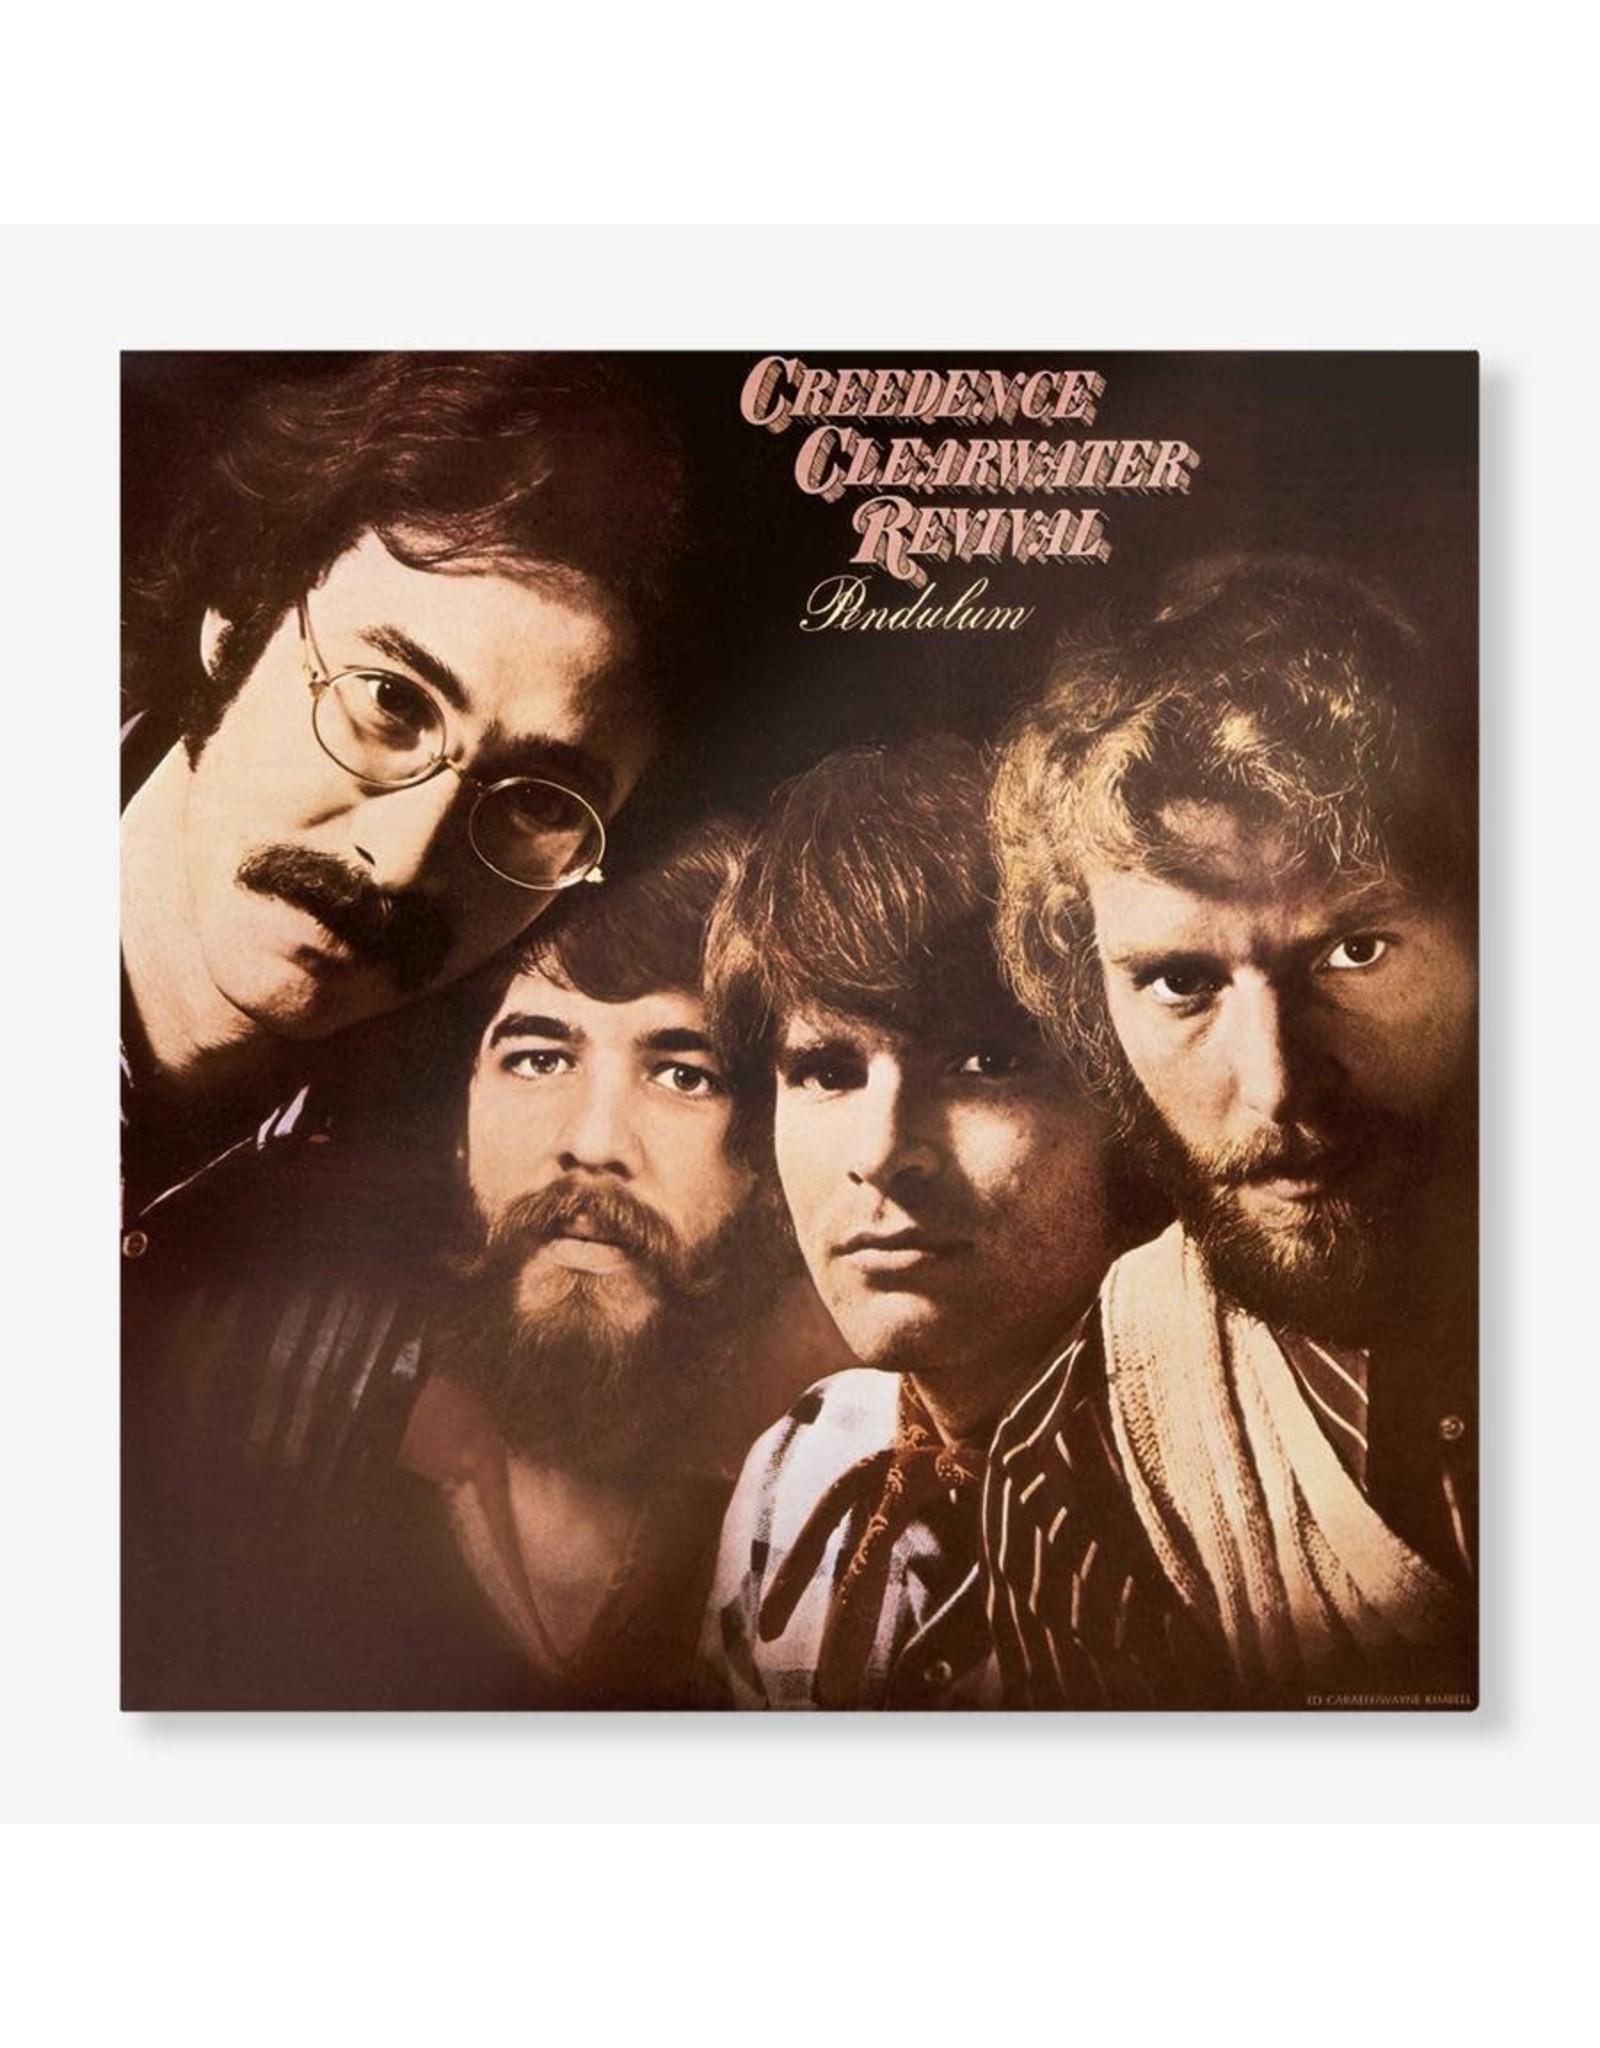 Creedence Clearwater Revival - Pendulum (Half Speed Master) LP